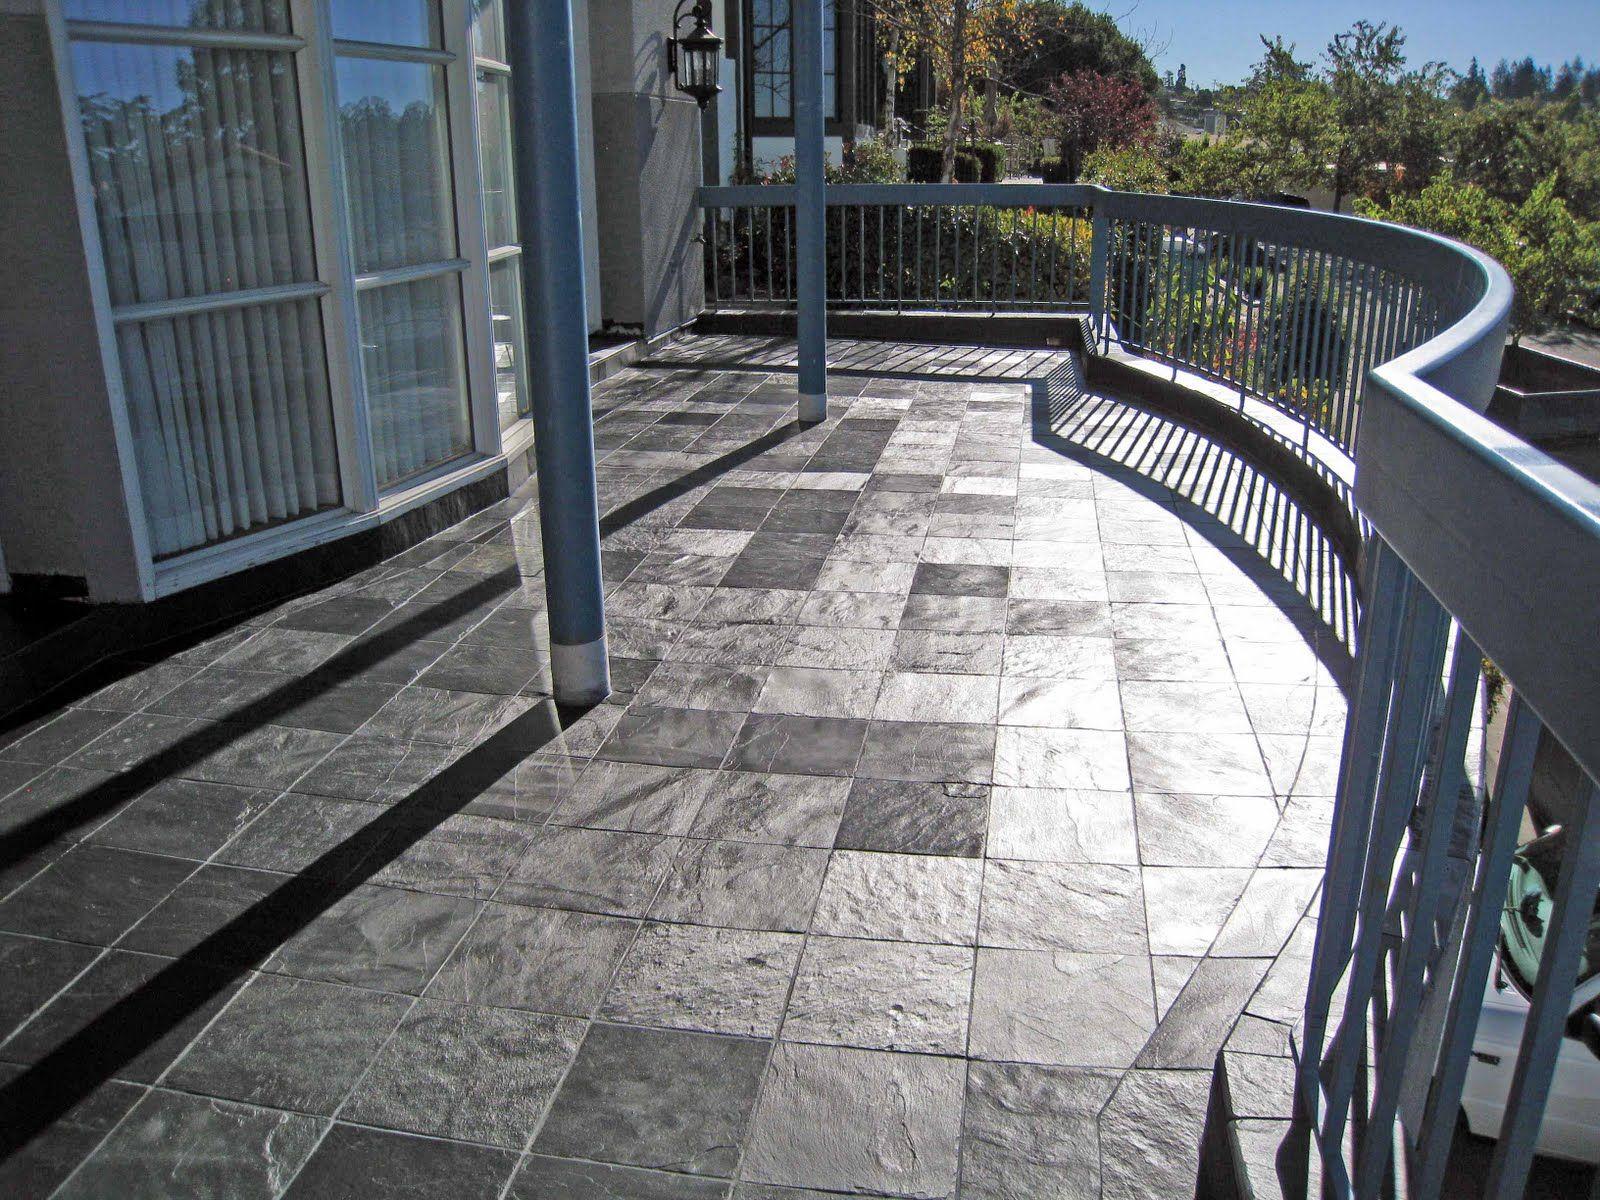 Front Entry Decks Porcelainstone Tile On Outdoor Decks Over regarding dimensions 1600 X 1200